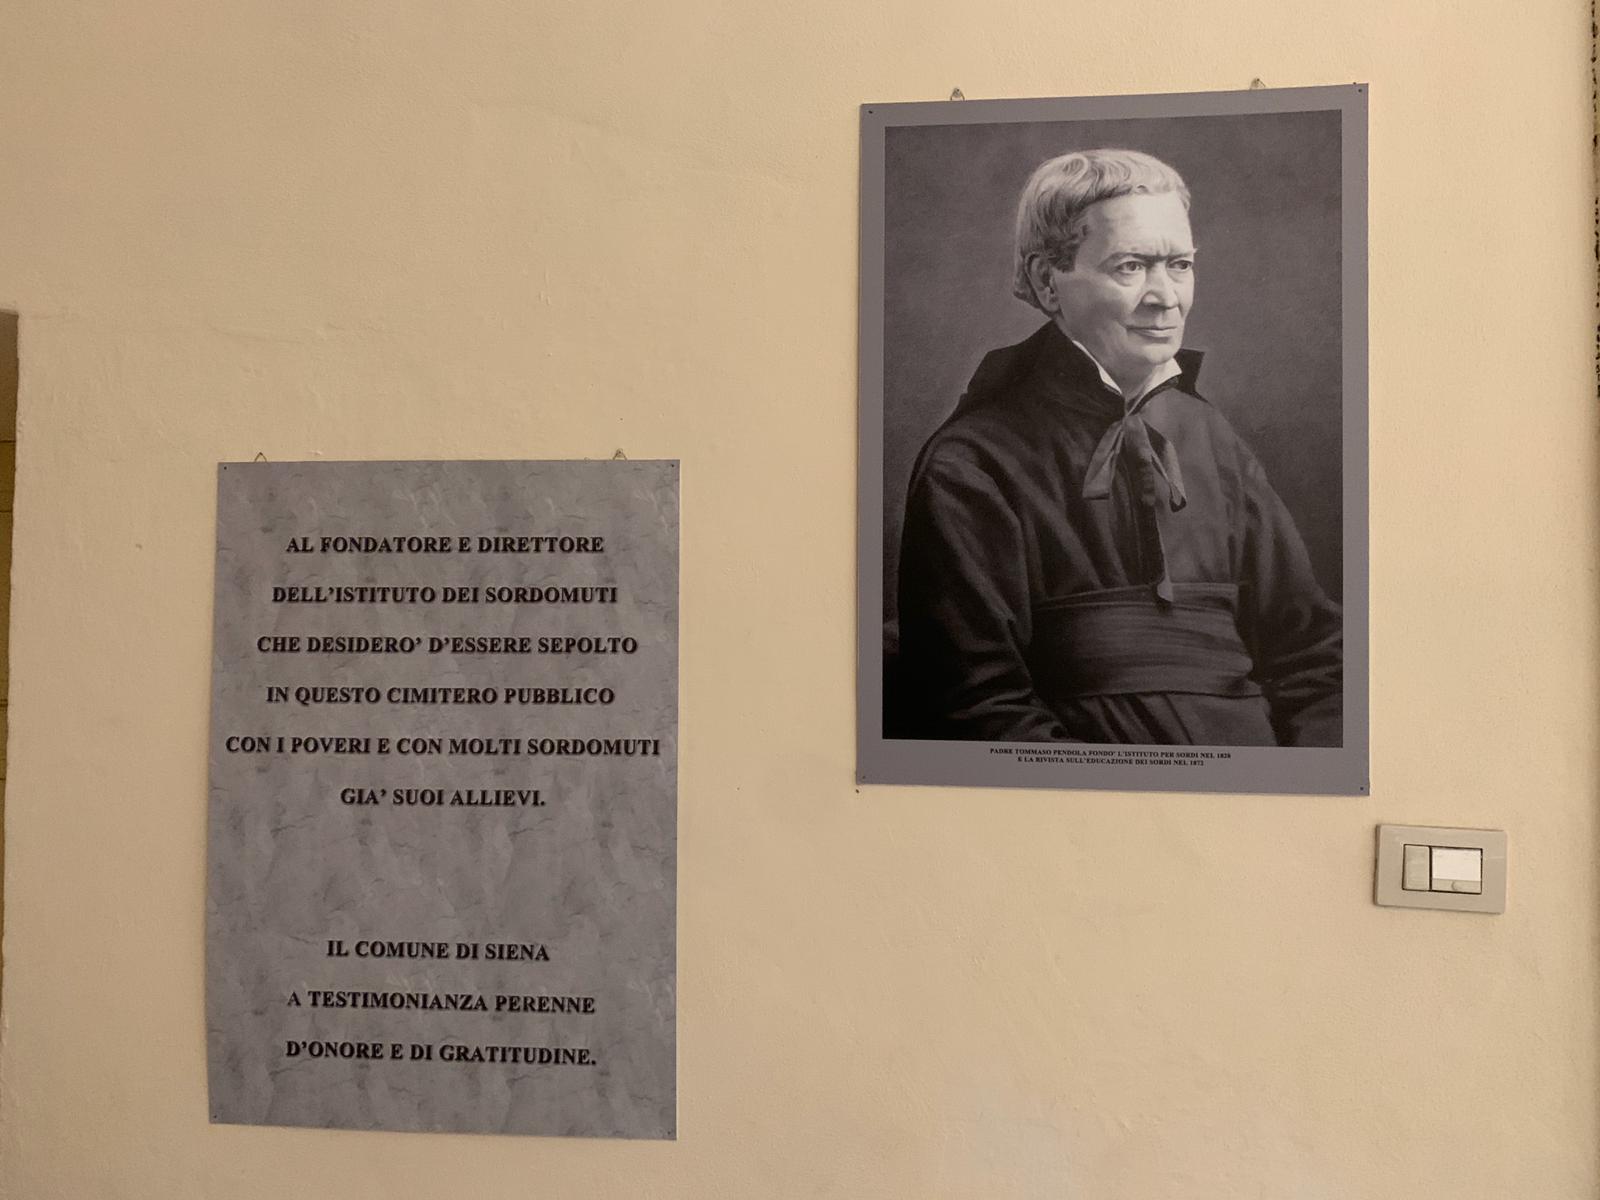 1800 - 1883: Tomasso Pendola